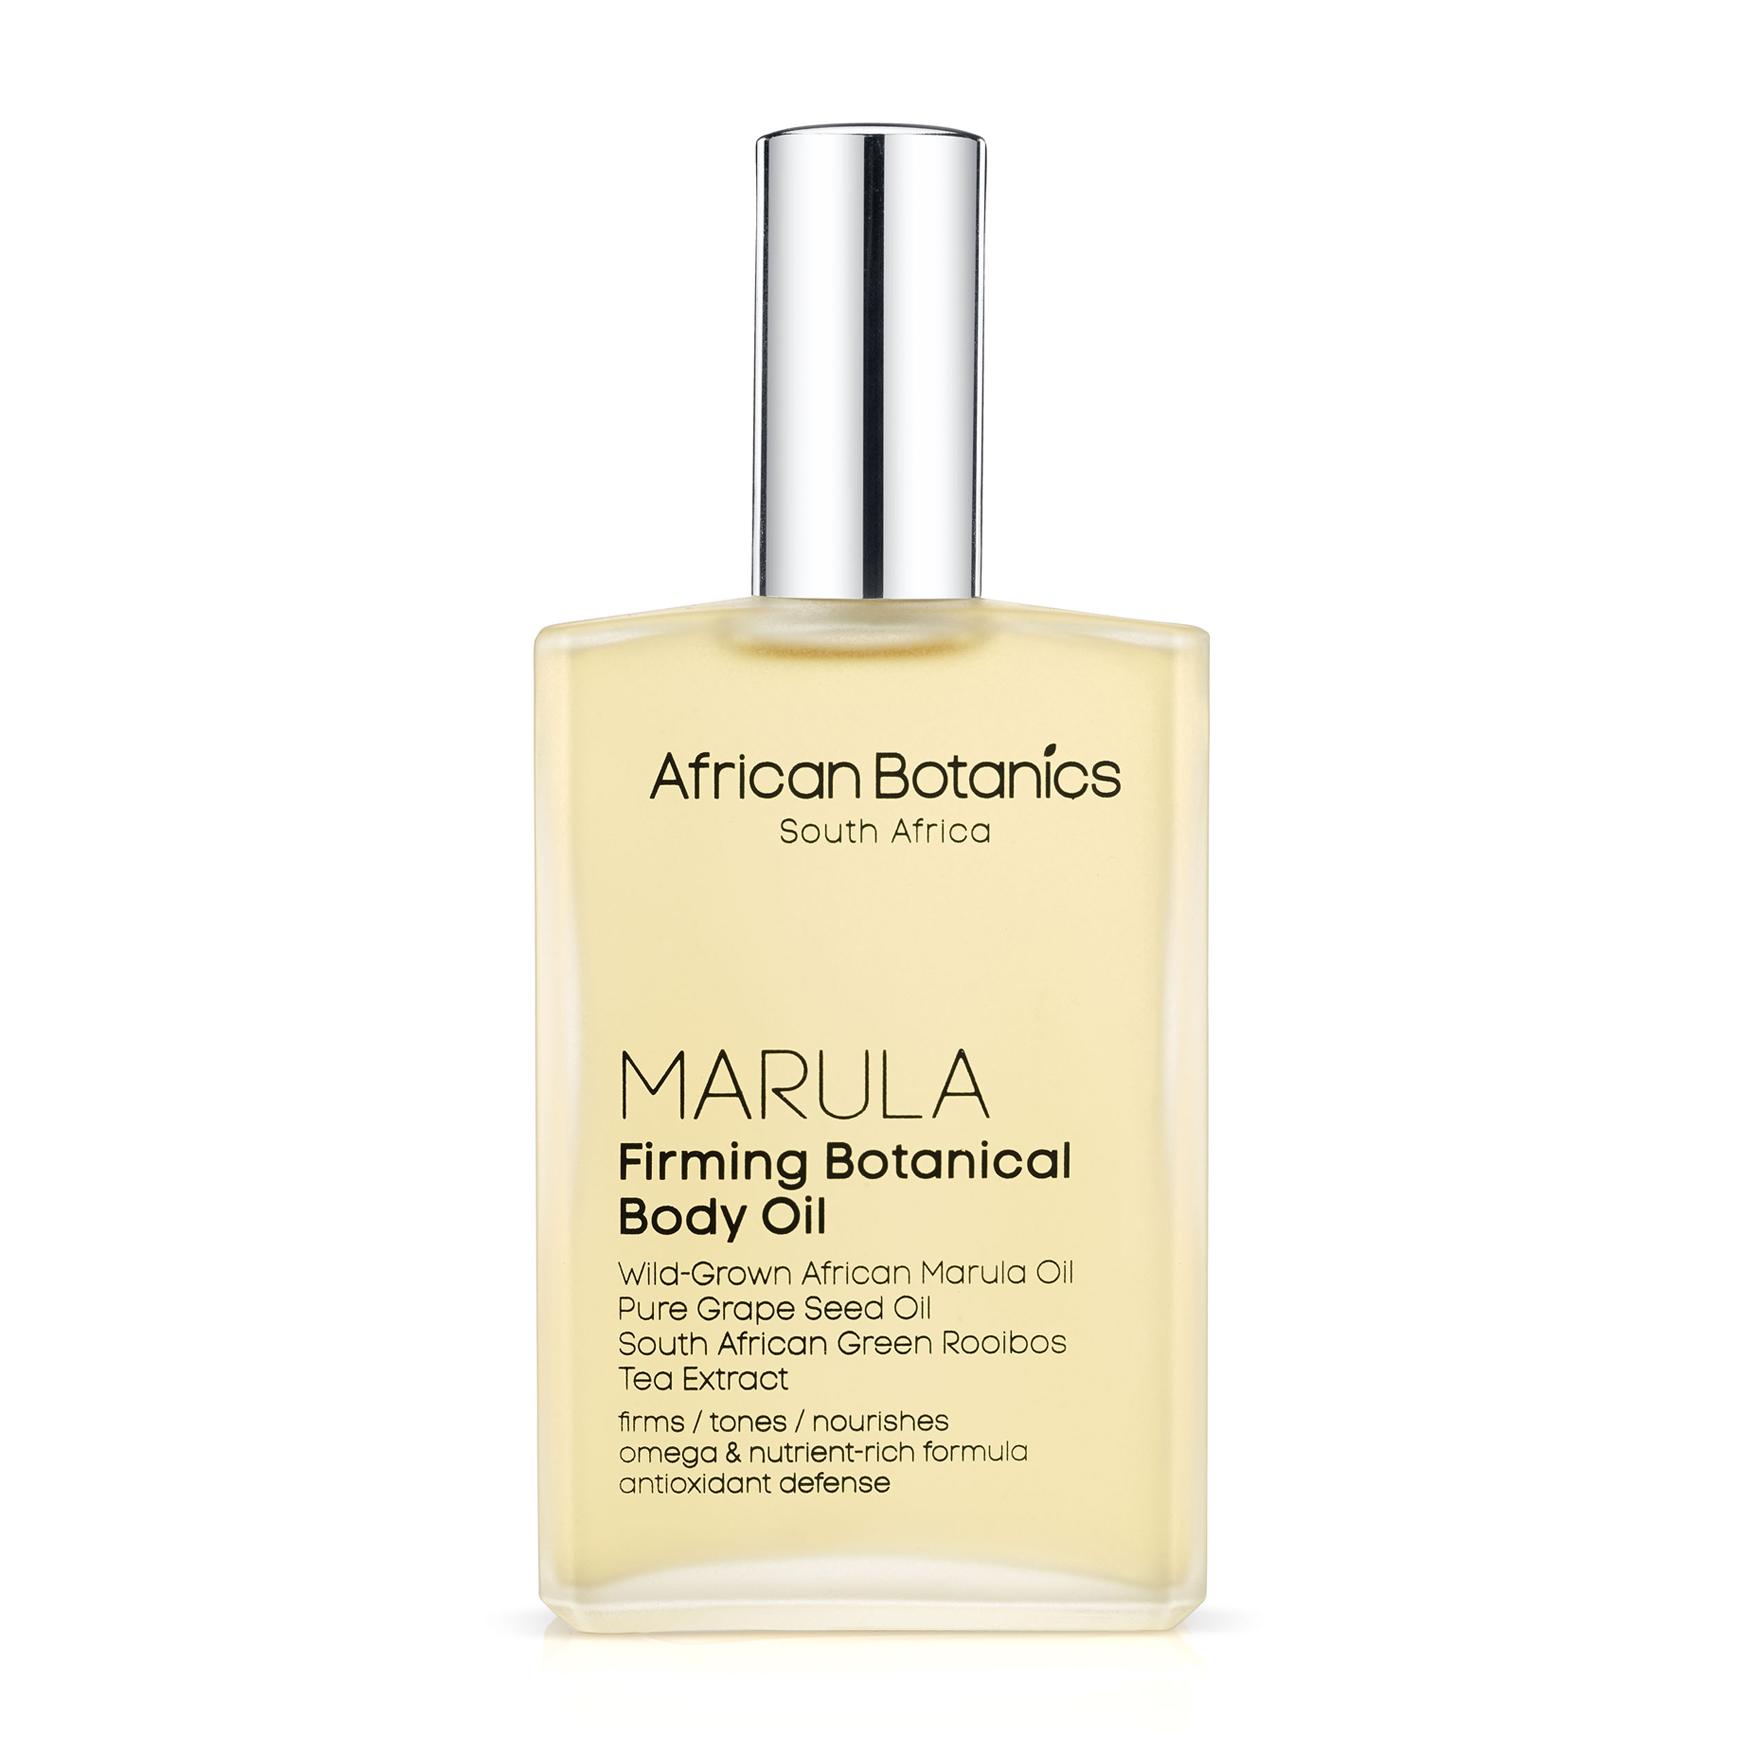 Marula Firming Botanical Body Oil, , large